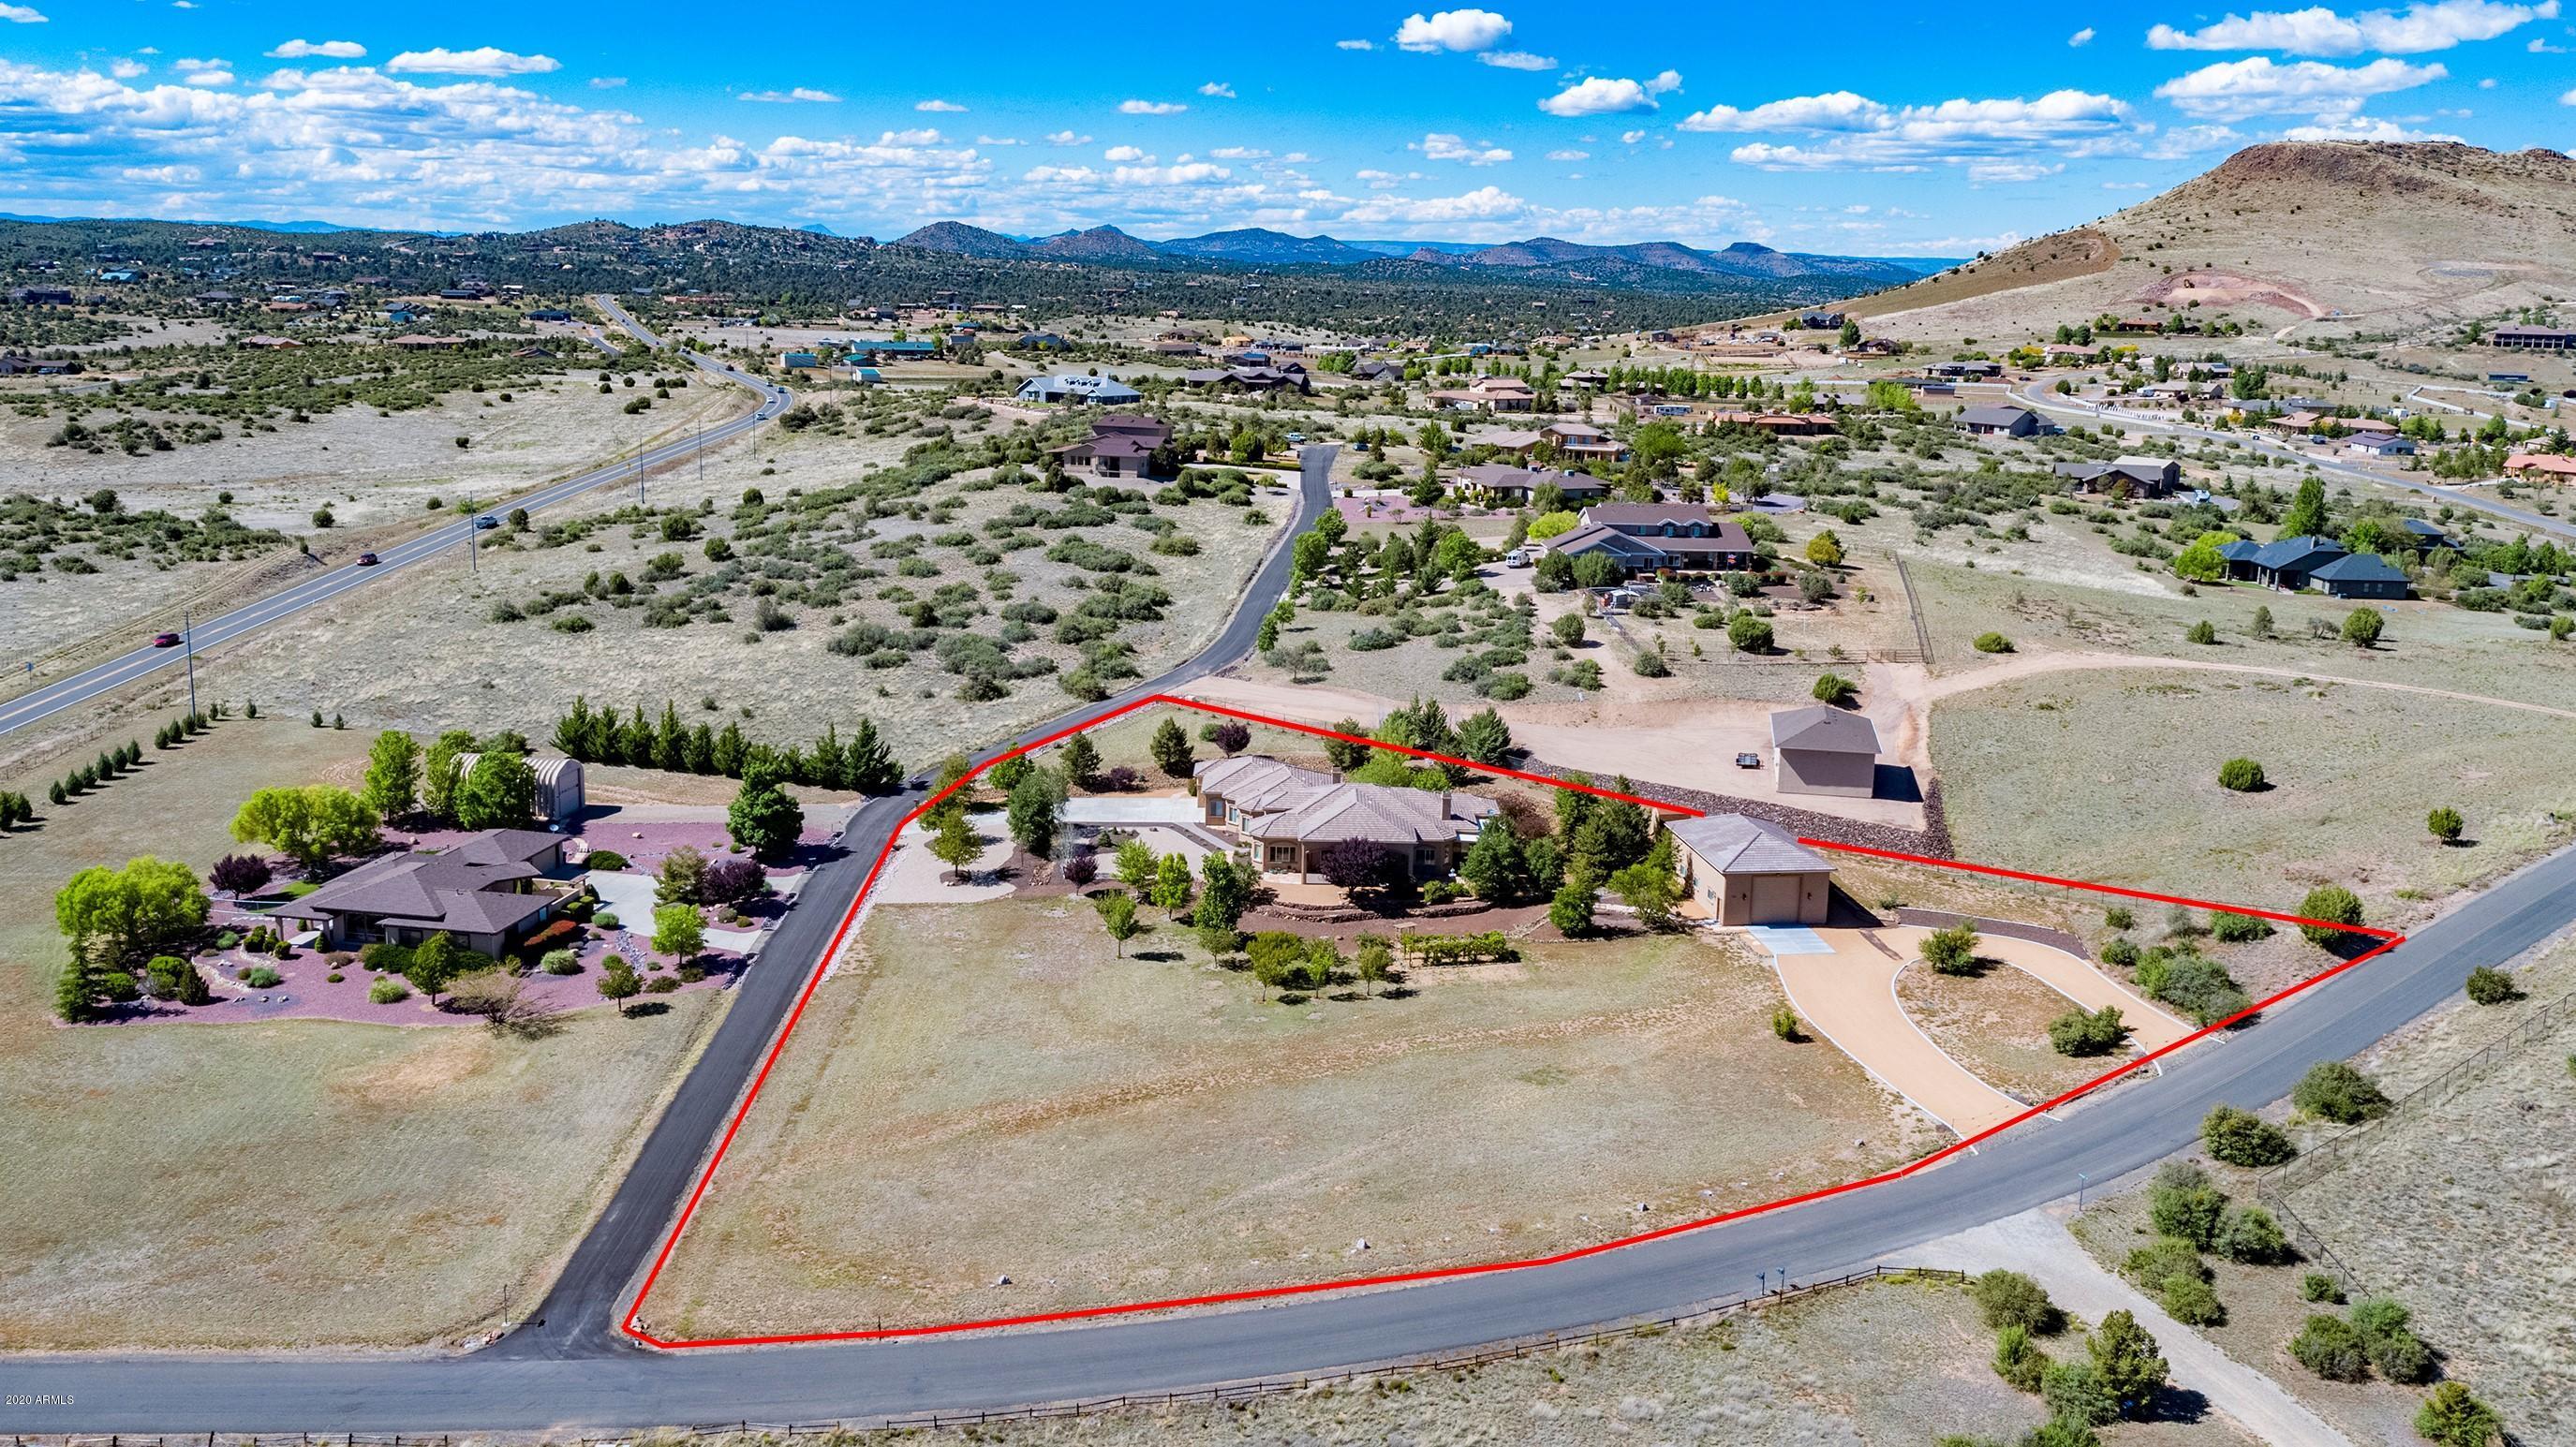 Photo of 11100 N WILLIAMSON VALLEY RANCH Road, Prescott, AZ 86305